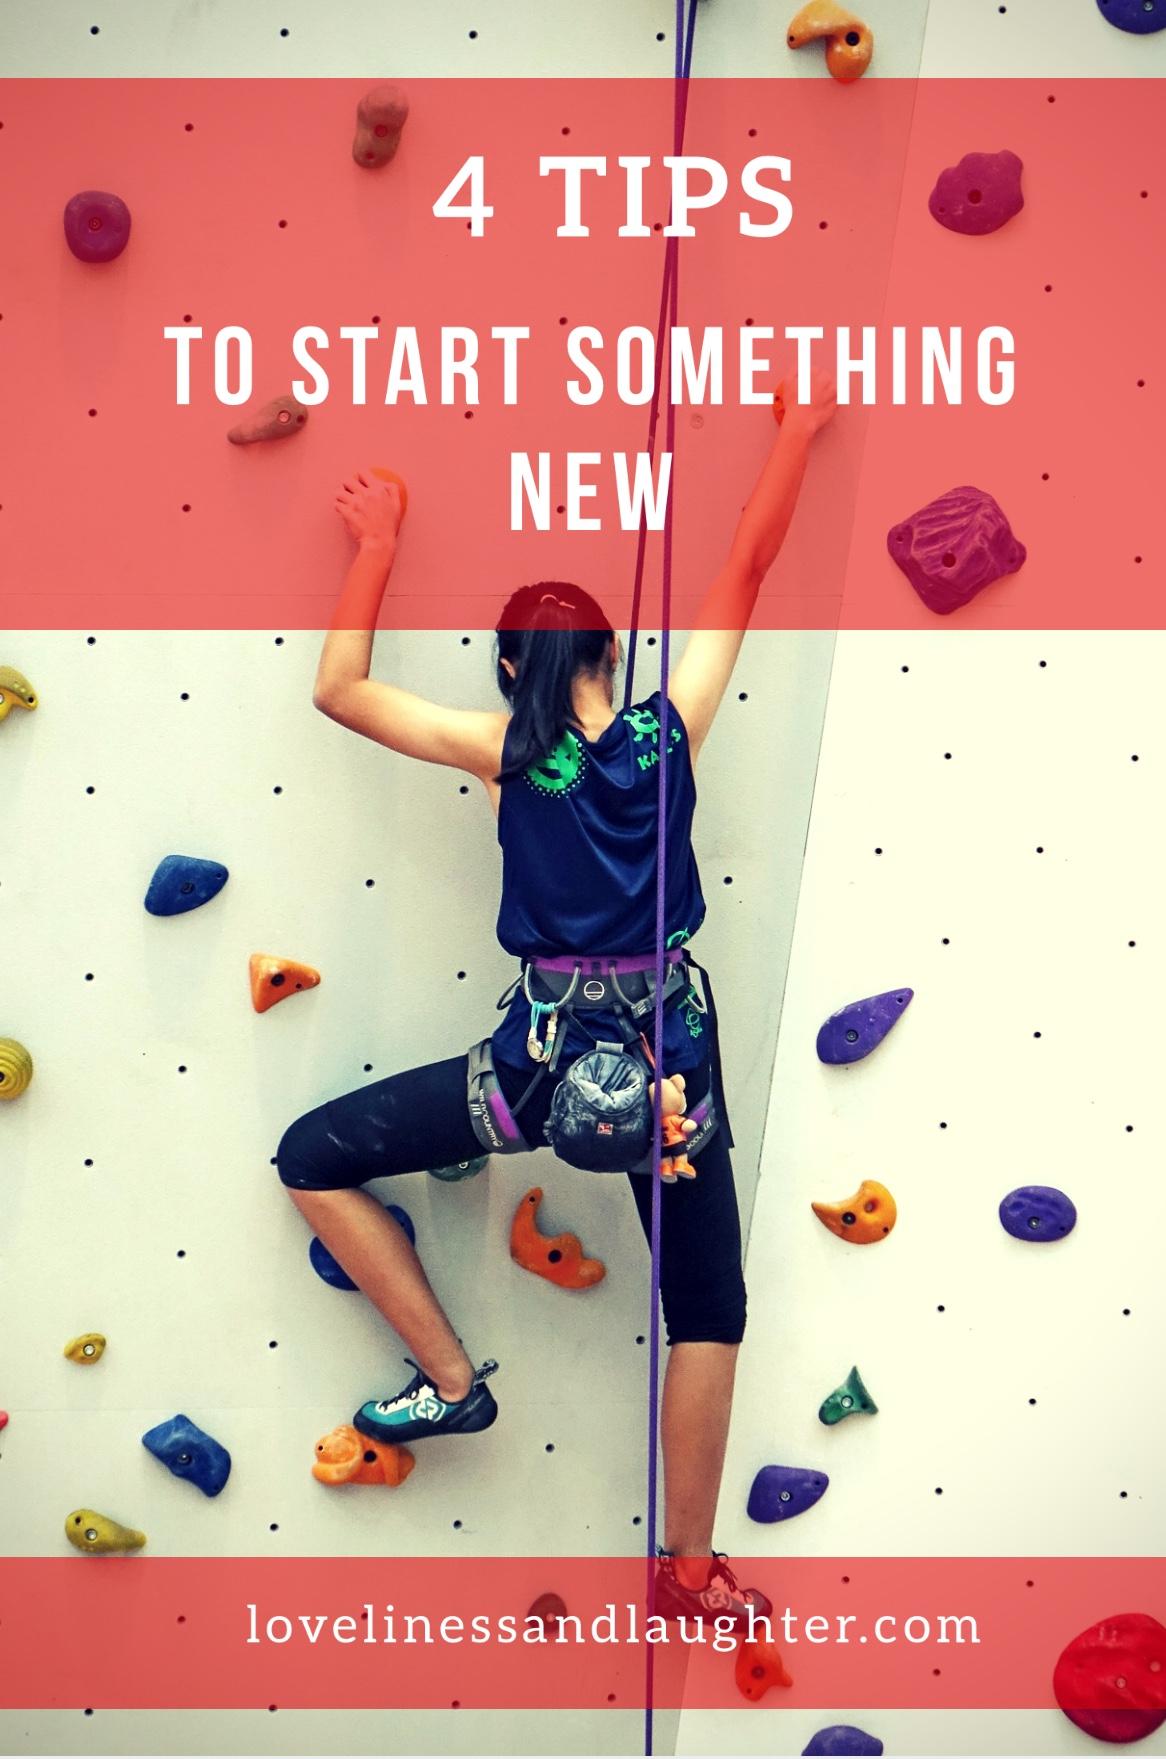 4 Tips to start something new